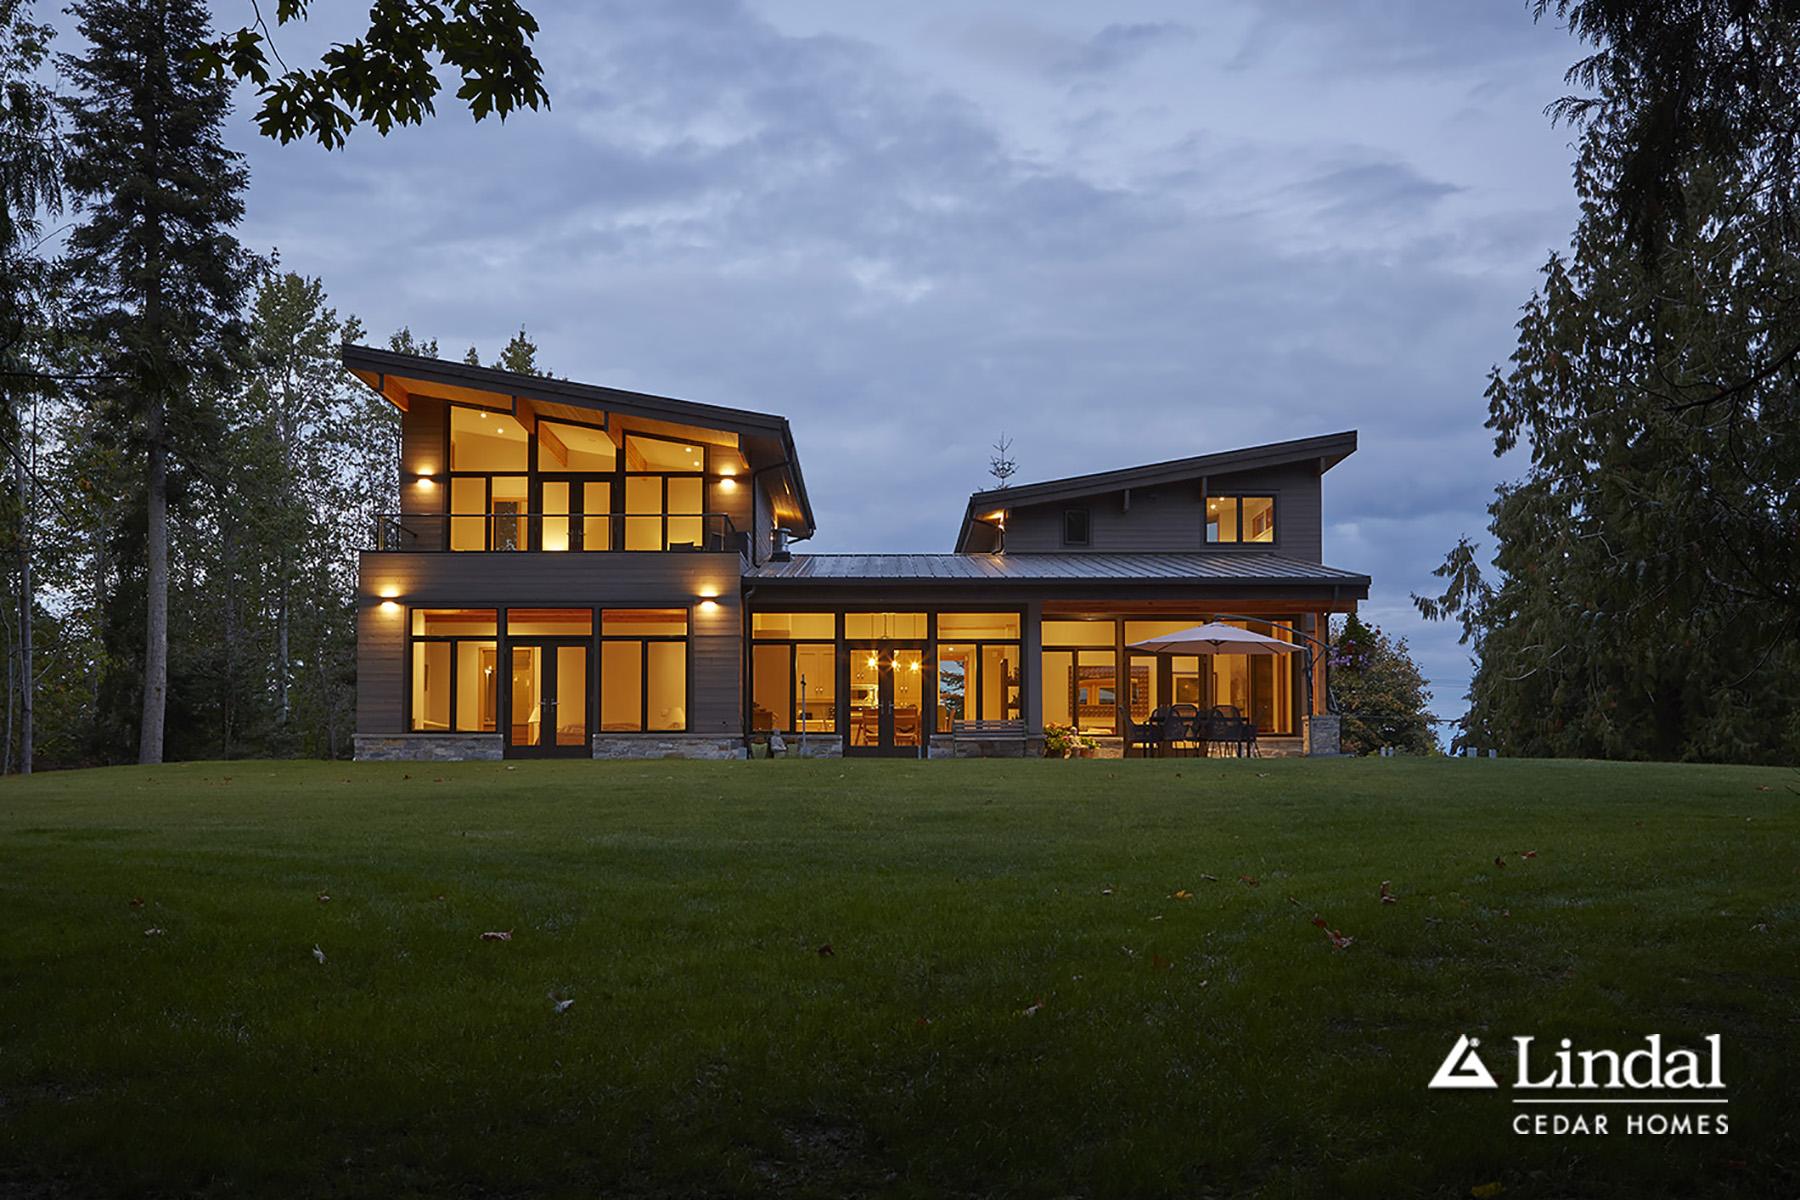 modern home with windows | lindal cedar homes